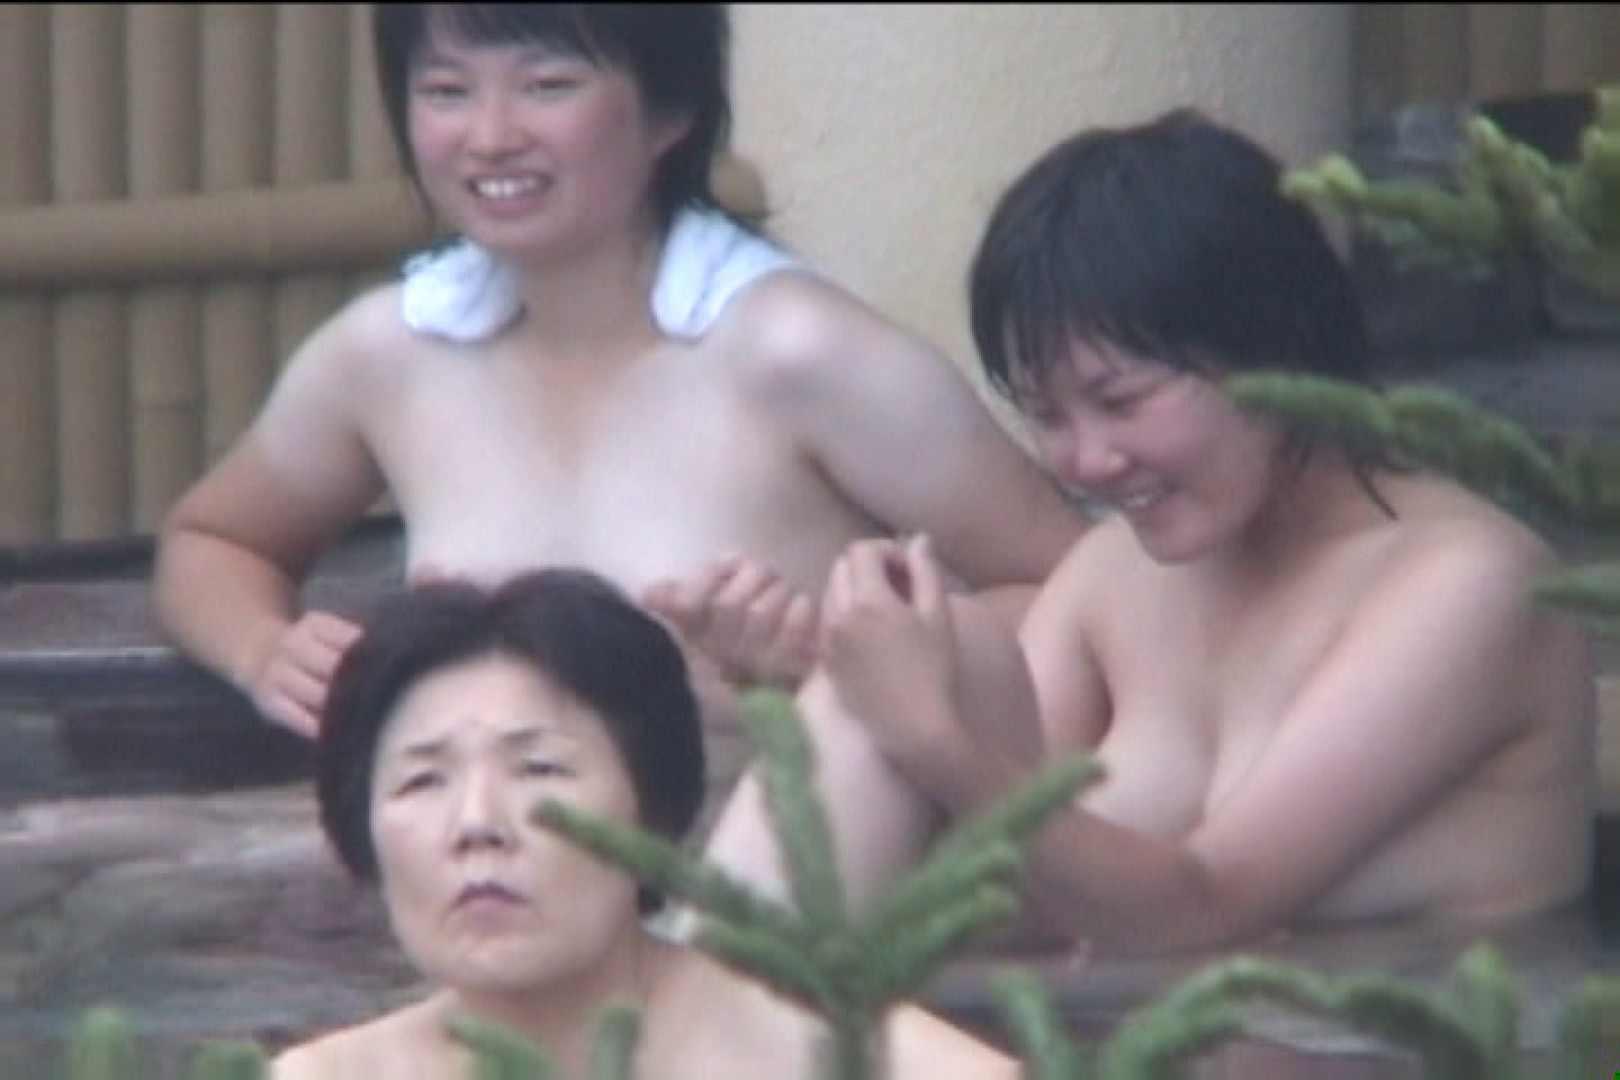 Aquaな露天風呂Vol.99【VIP限定】 露天風呂編 | 盗撮シリーズ  108PIX 45